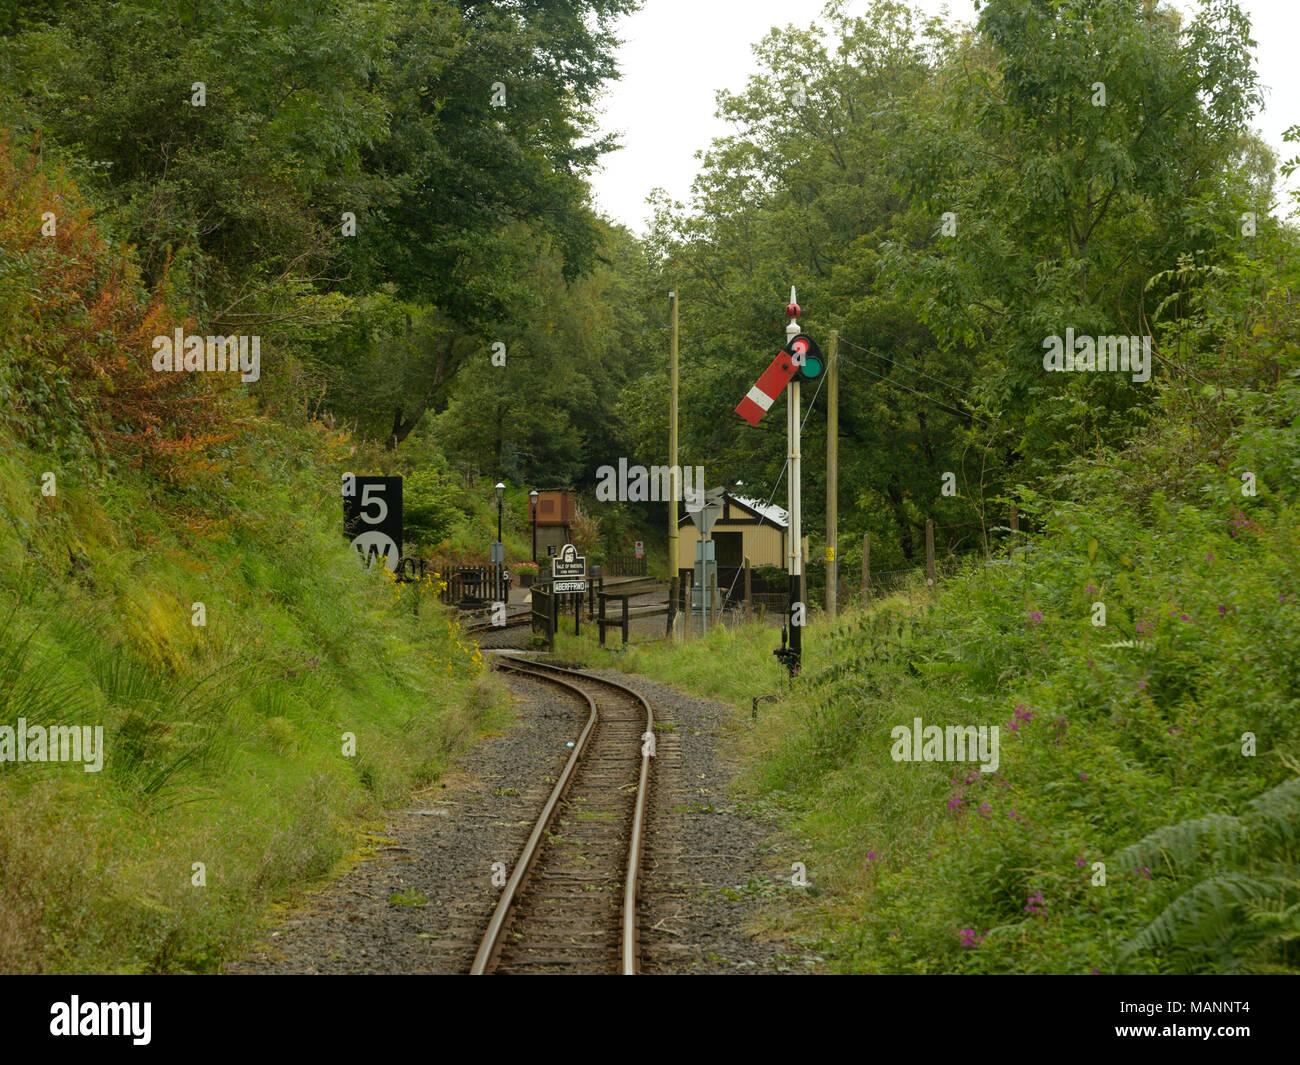 Rheidol Valley Railway, coming out of Aberffrwd Station - Stock Image